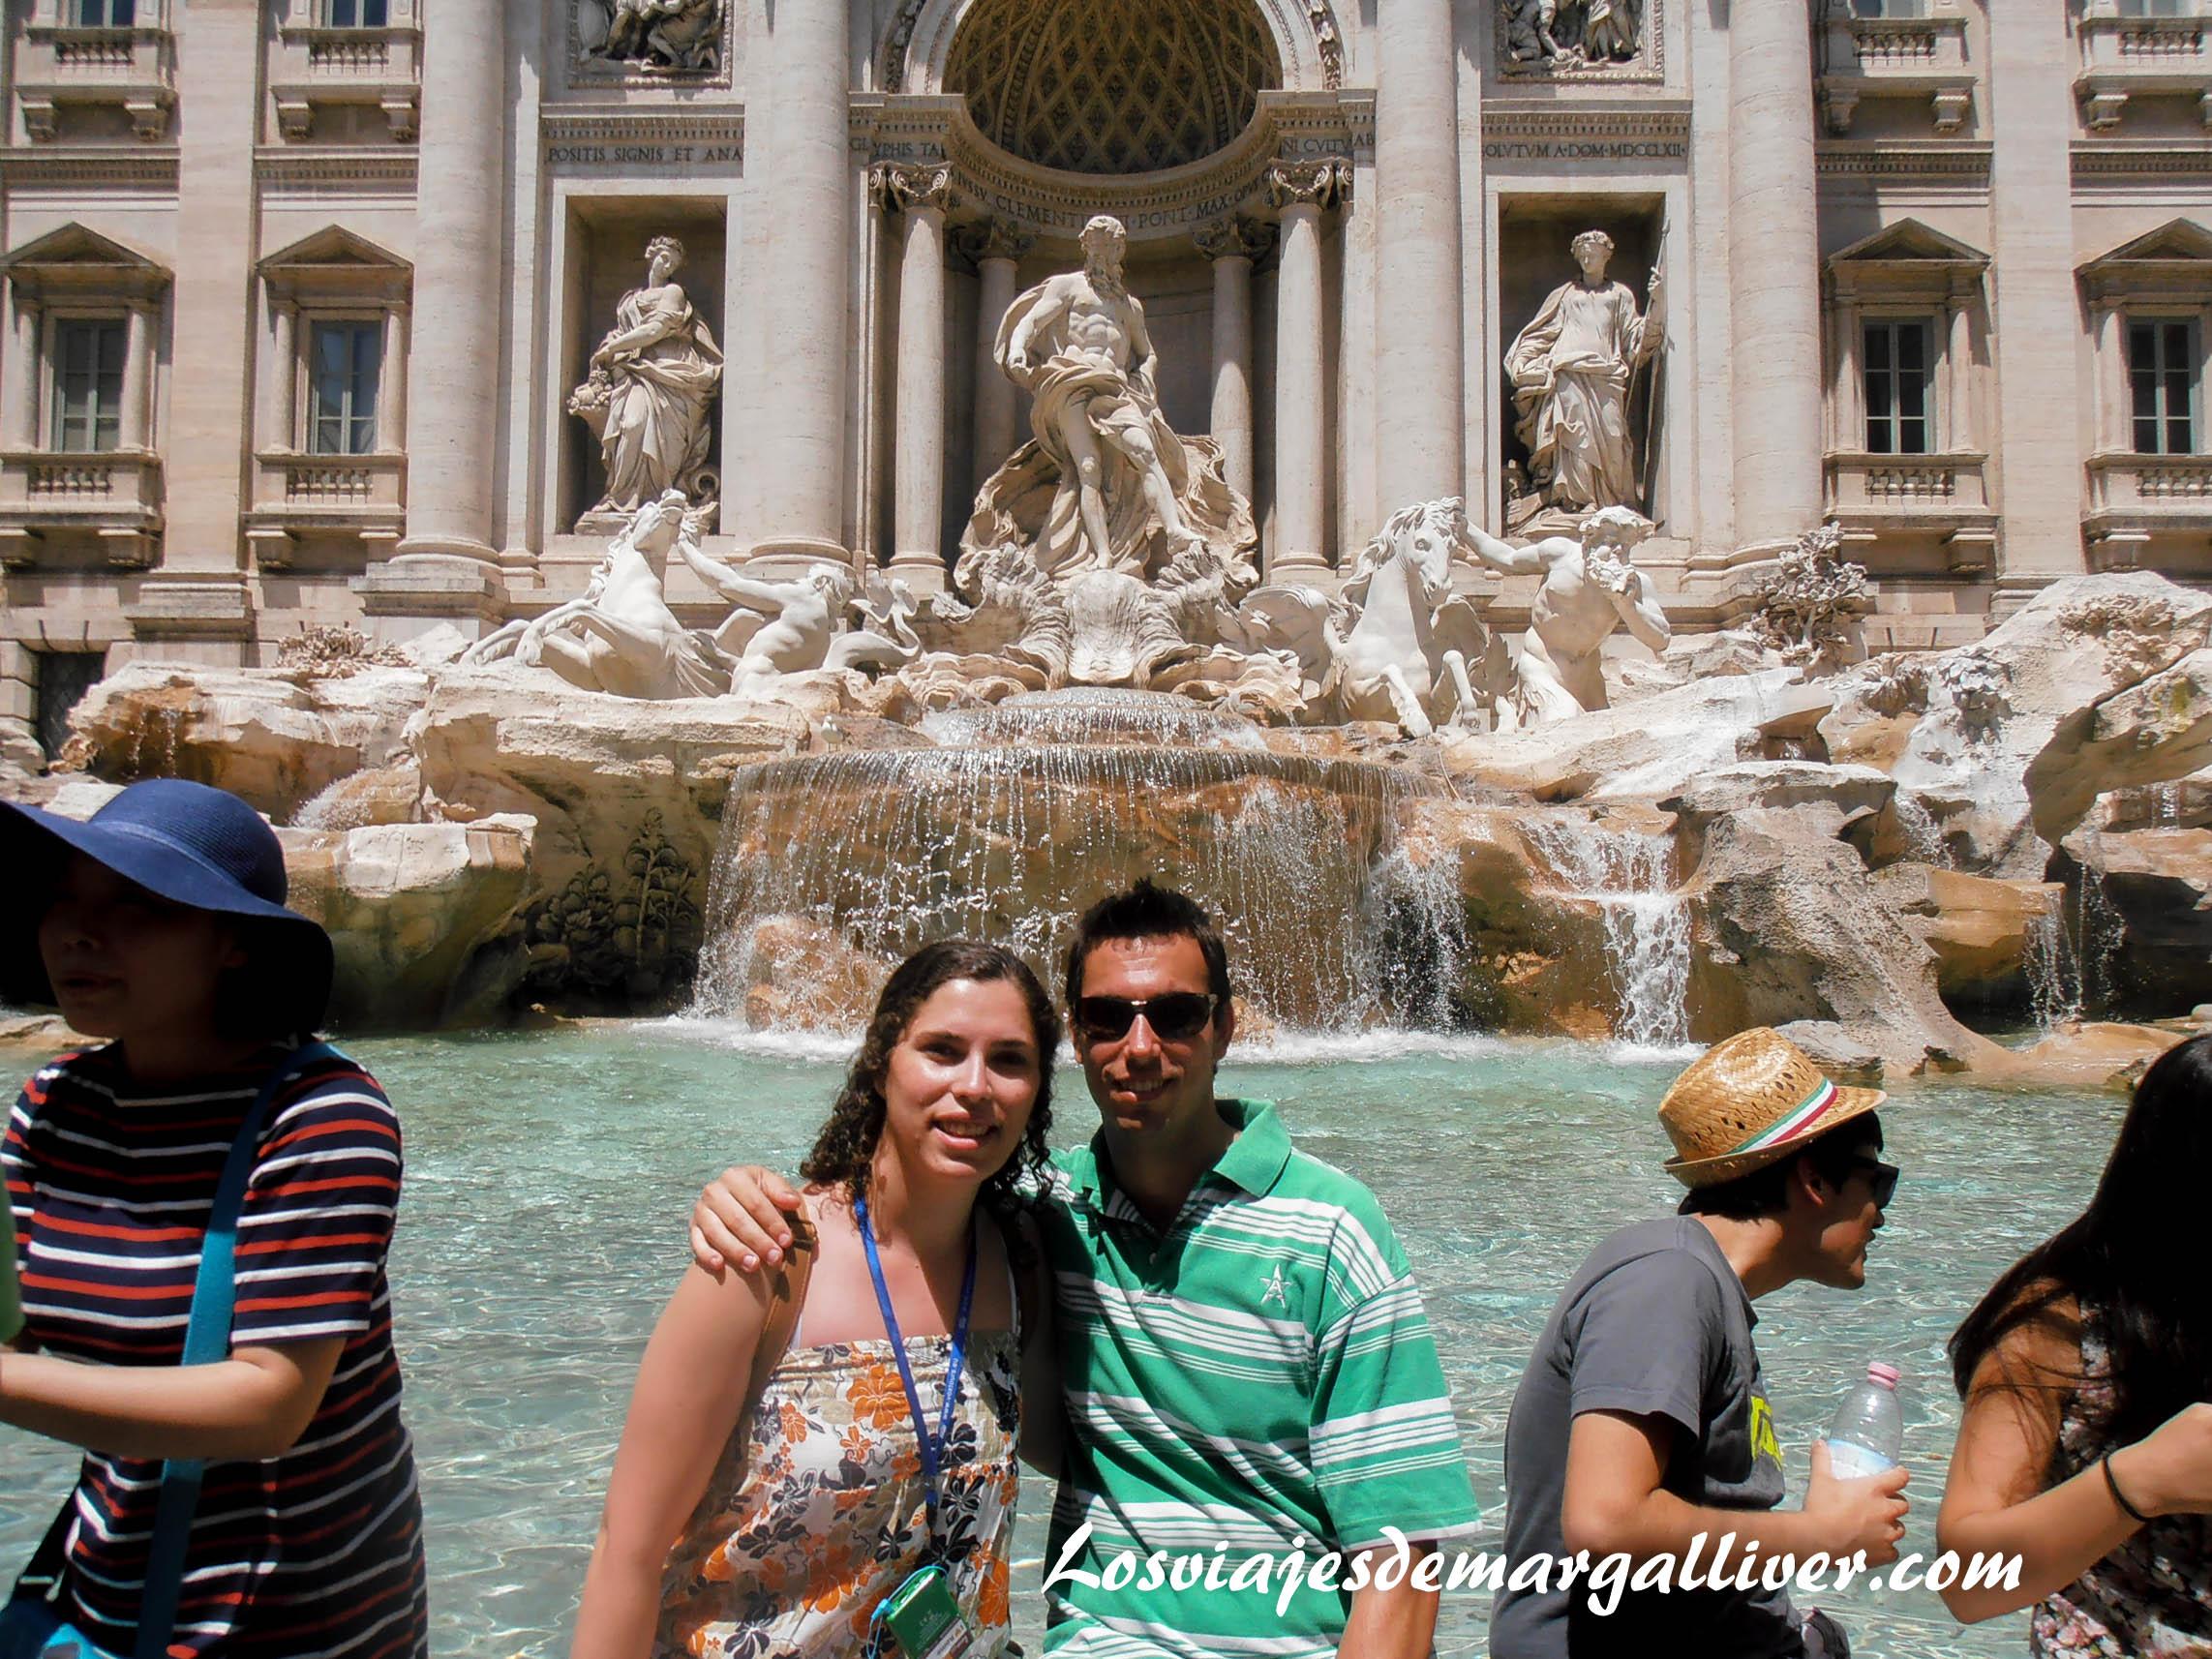 En la fontana di trevi de Roma, San Valentín - Los viajes de Margalliver